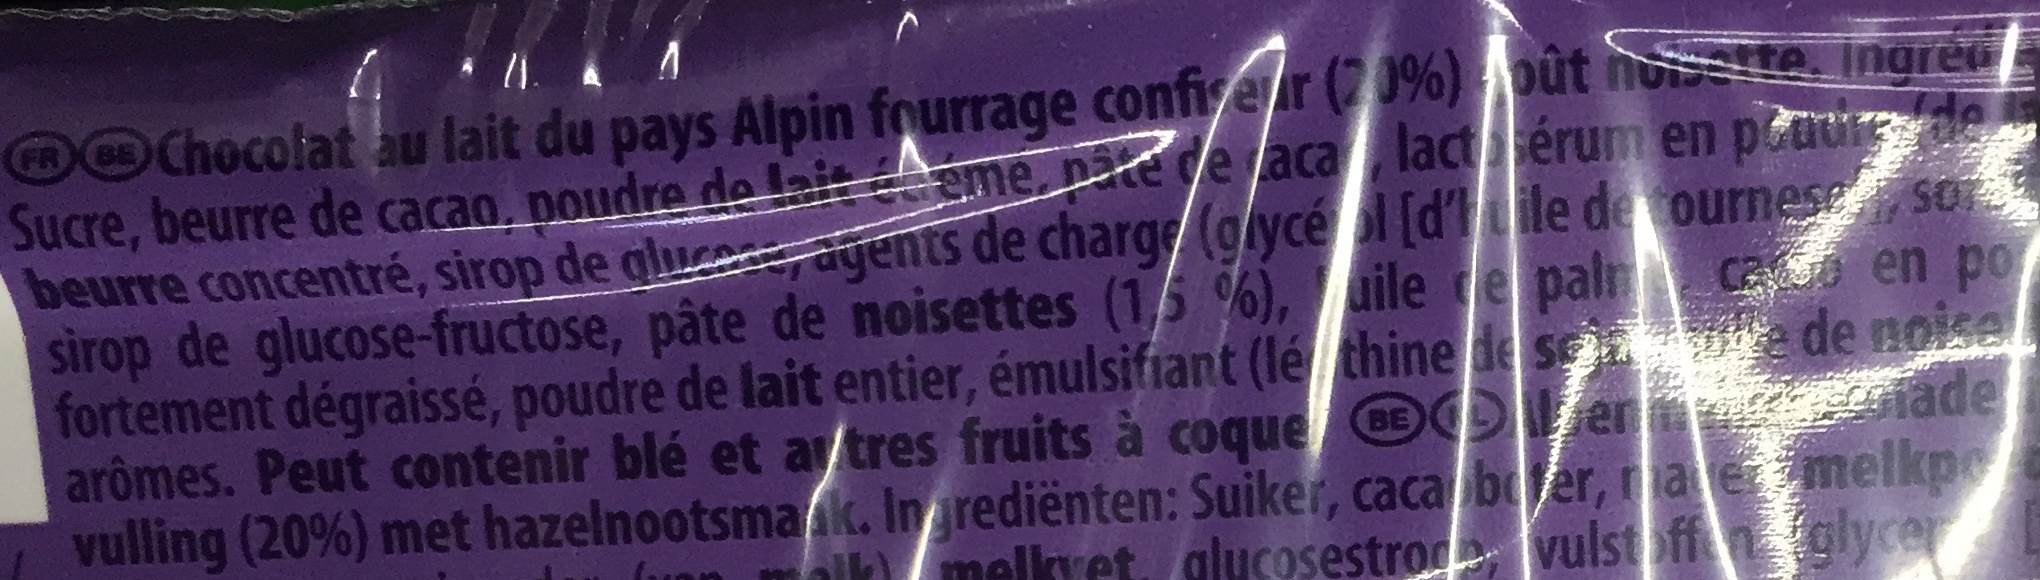 Choqsplash goût Noisette - Ingredients